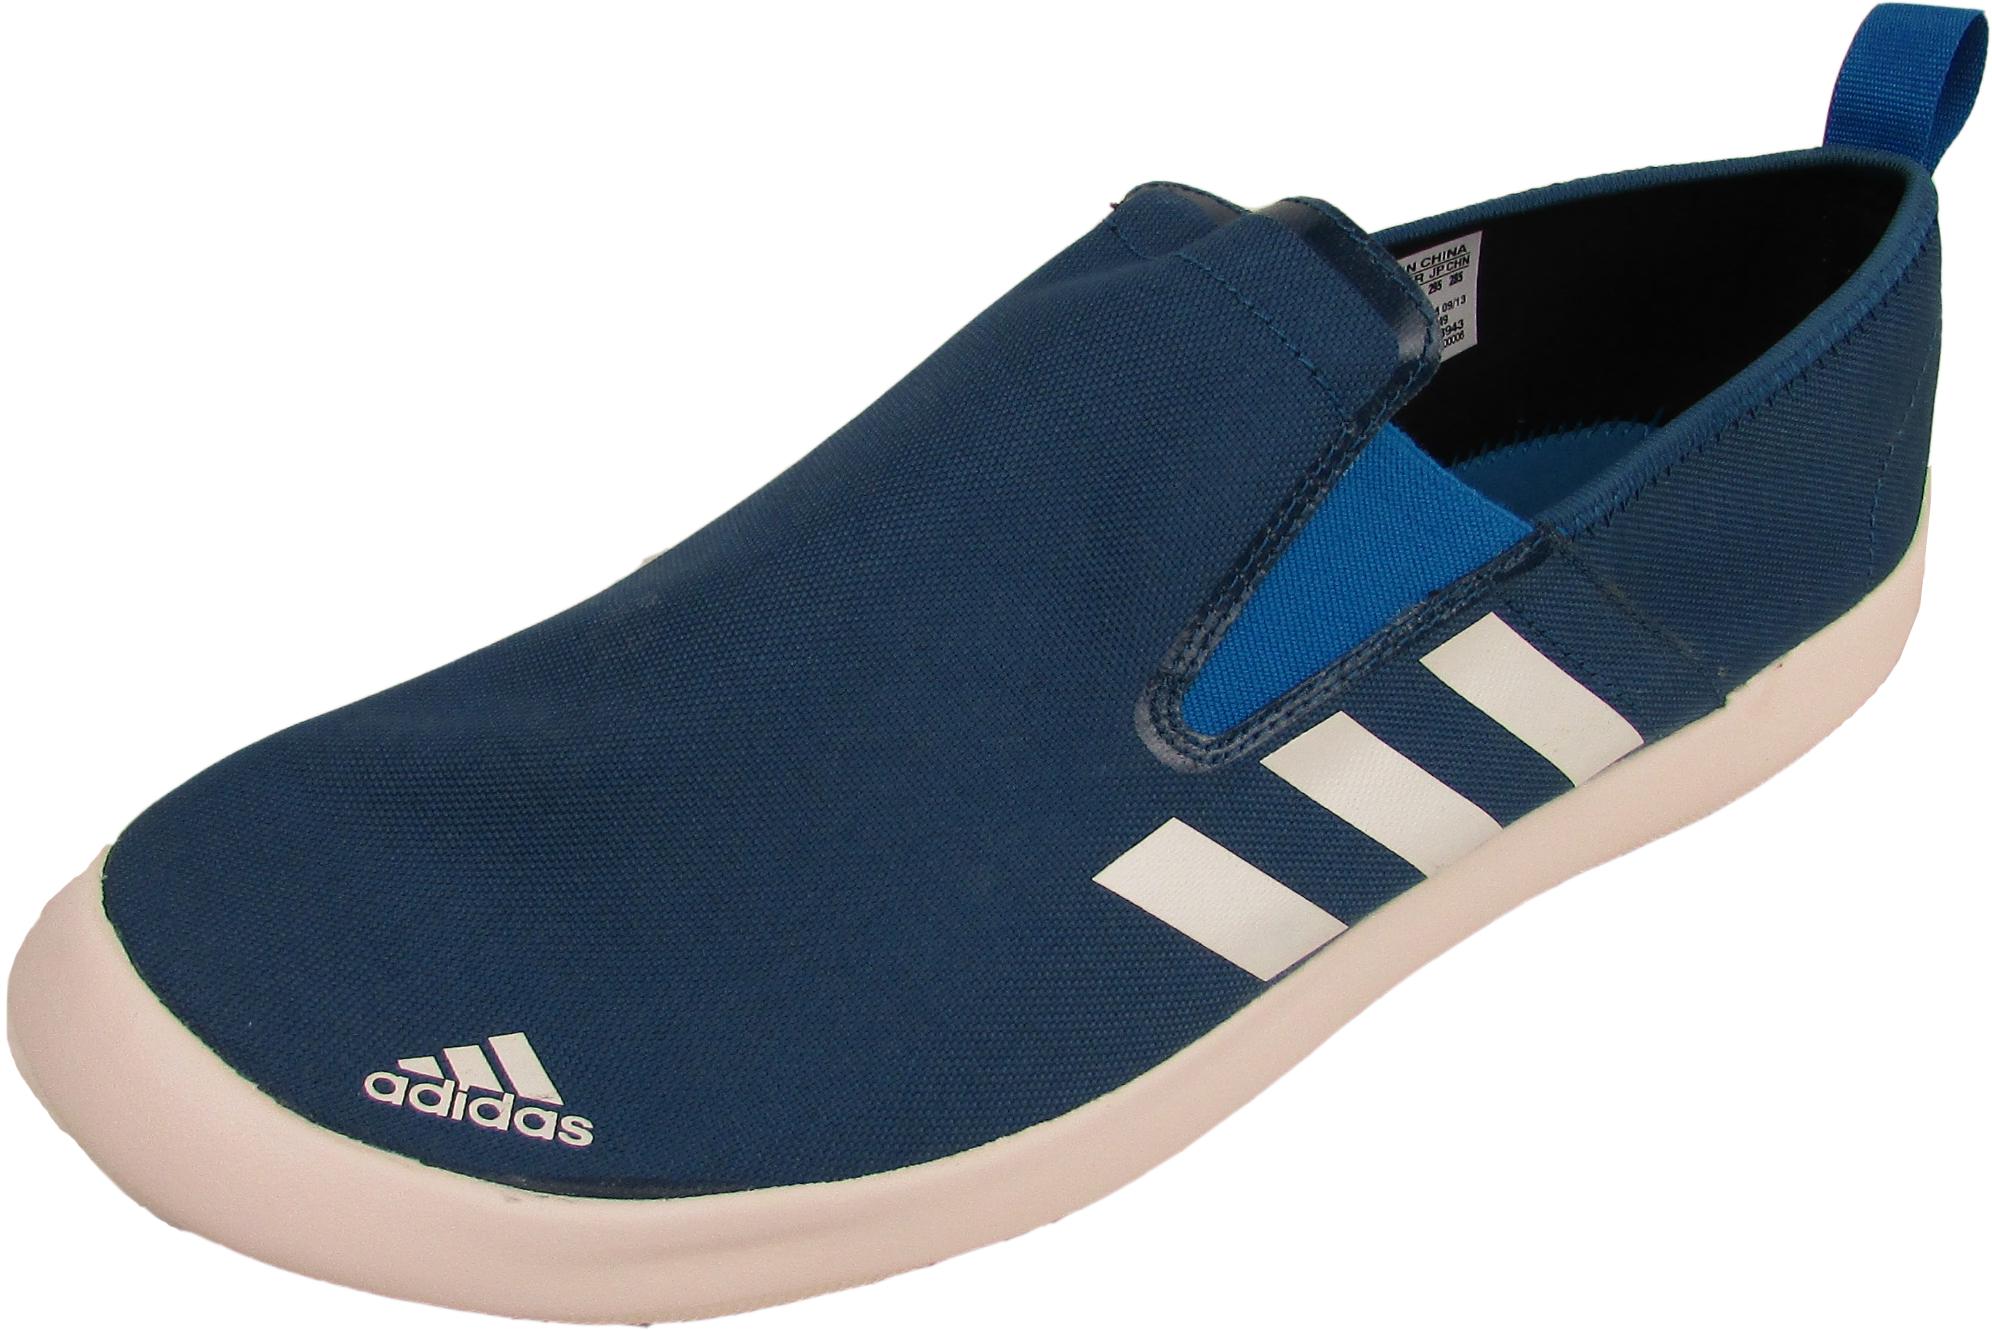 adidas shoes adidas shop buy adidas